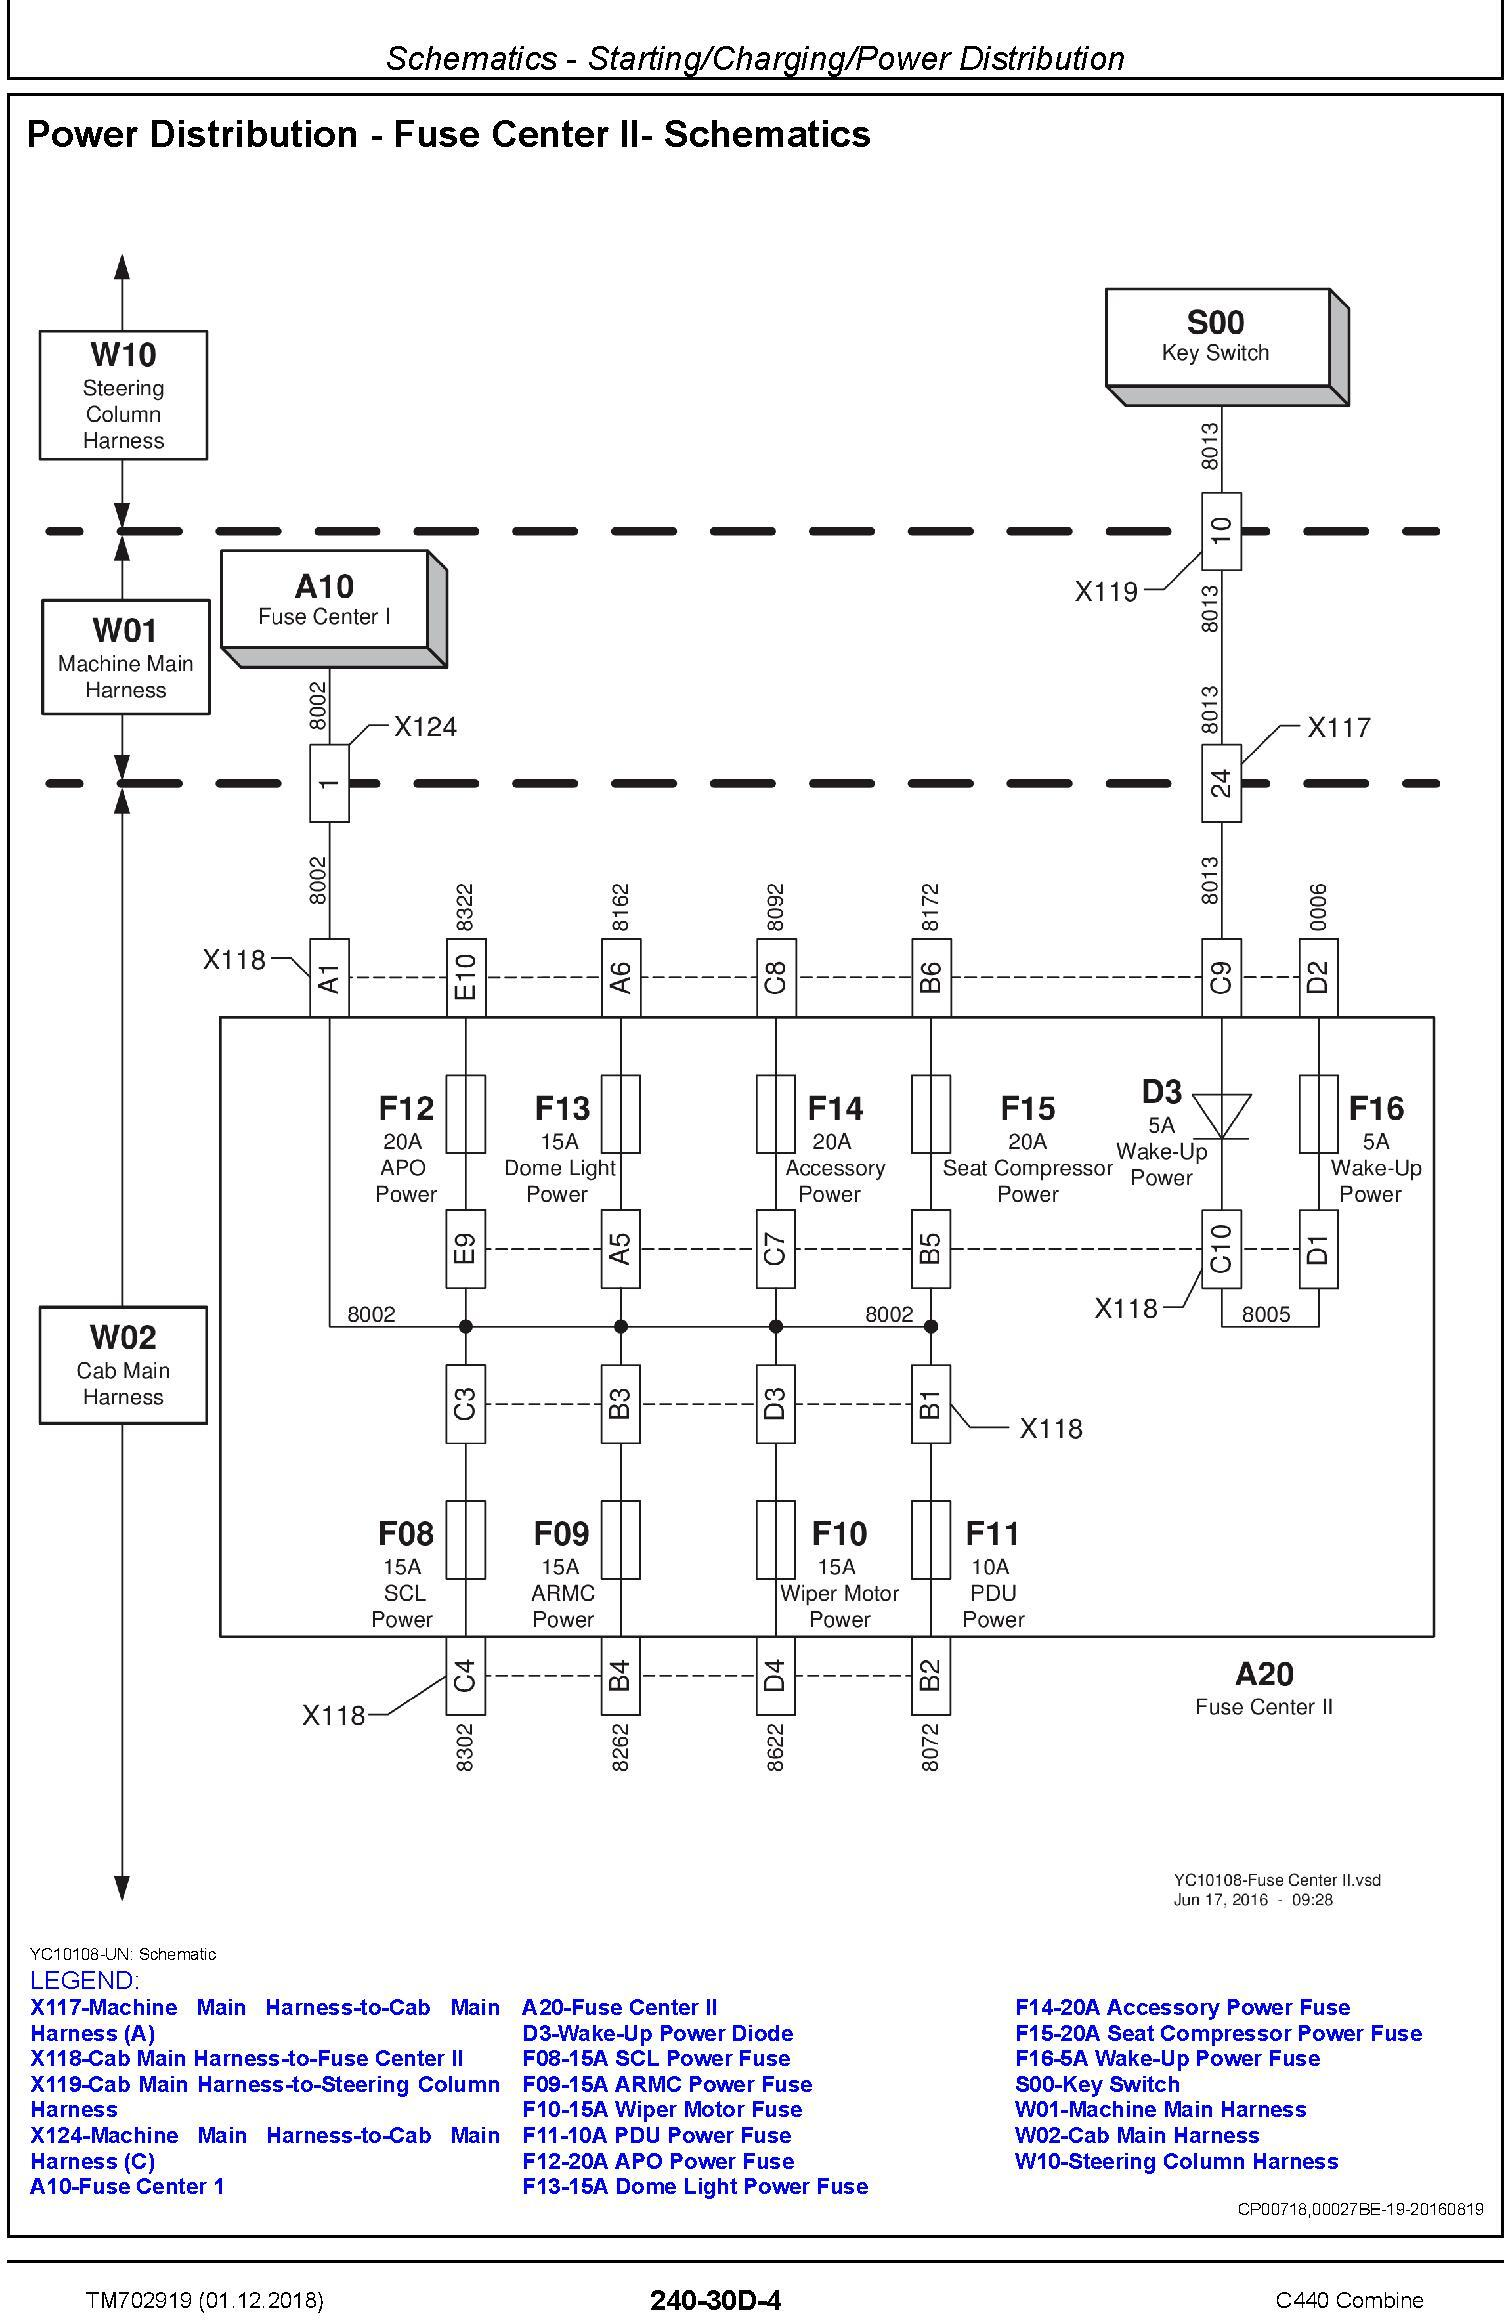 John Deere C440 Combine (SN. 020000-) Technical Service Manual (TM702919) - 2